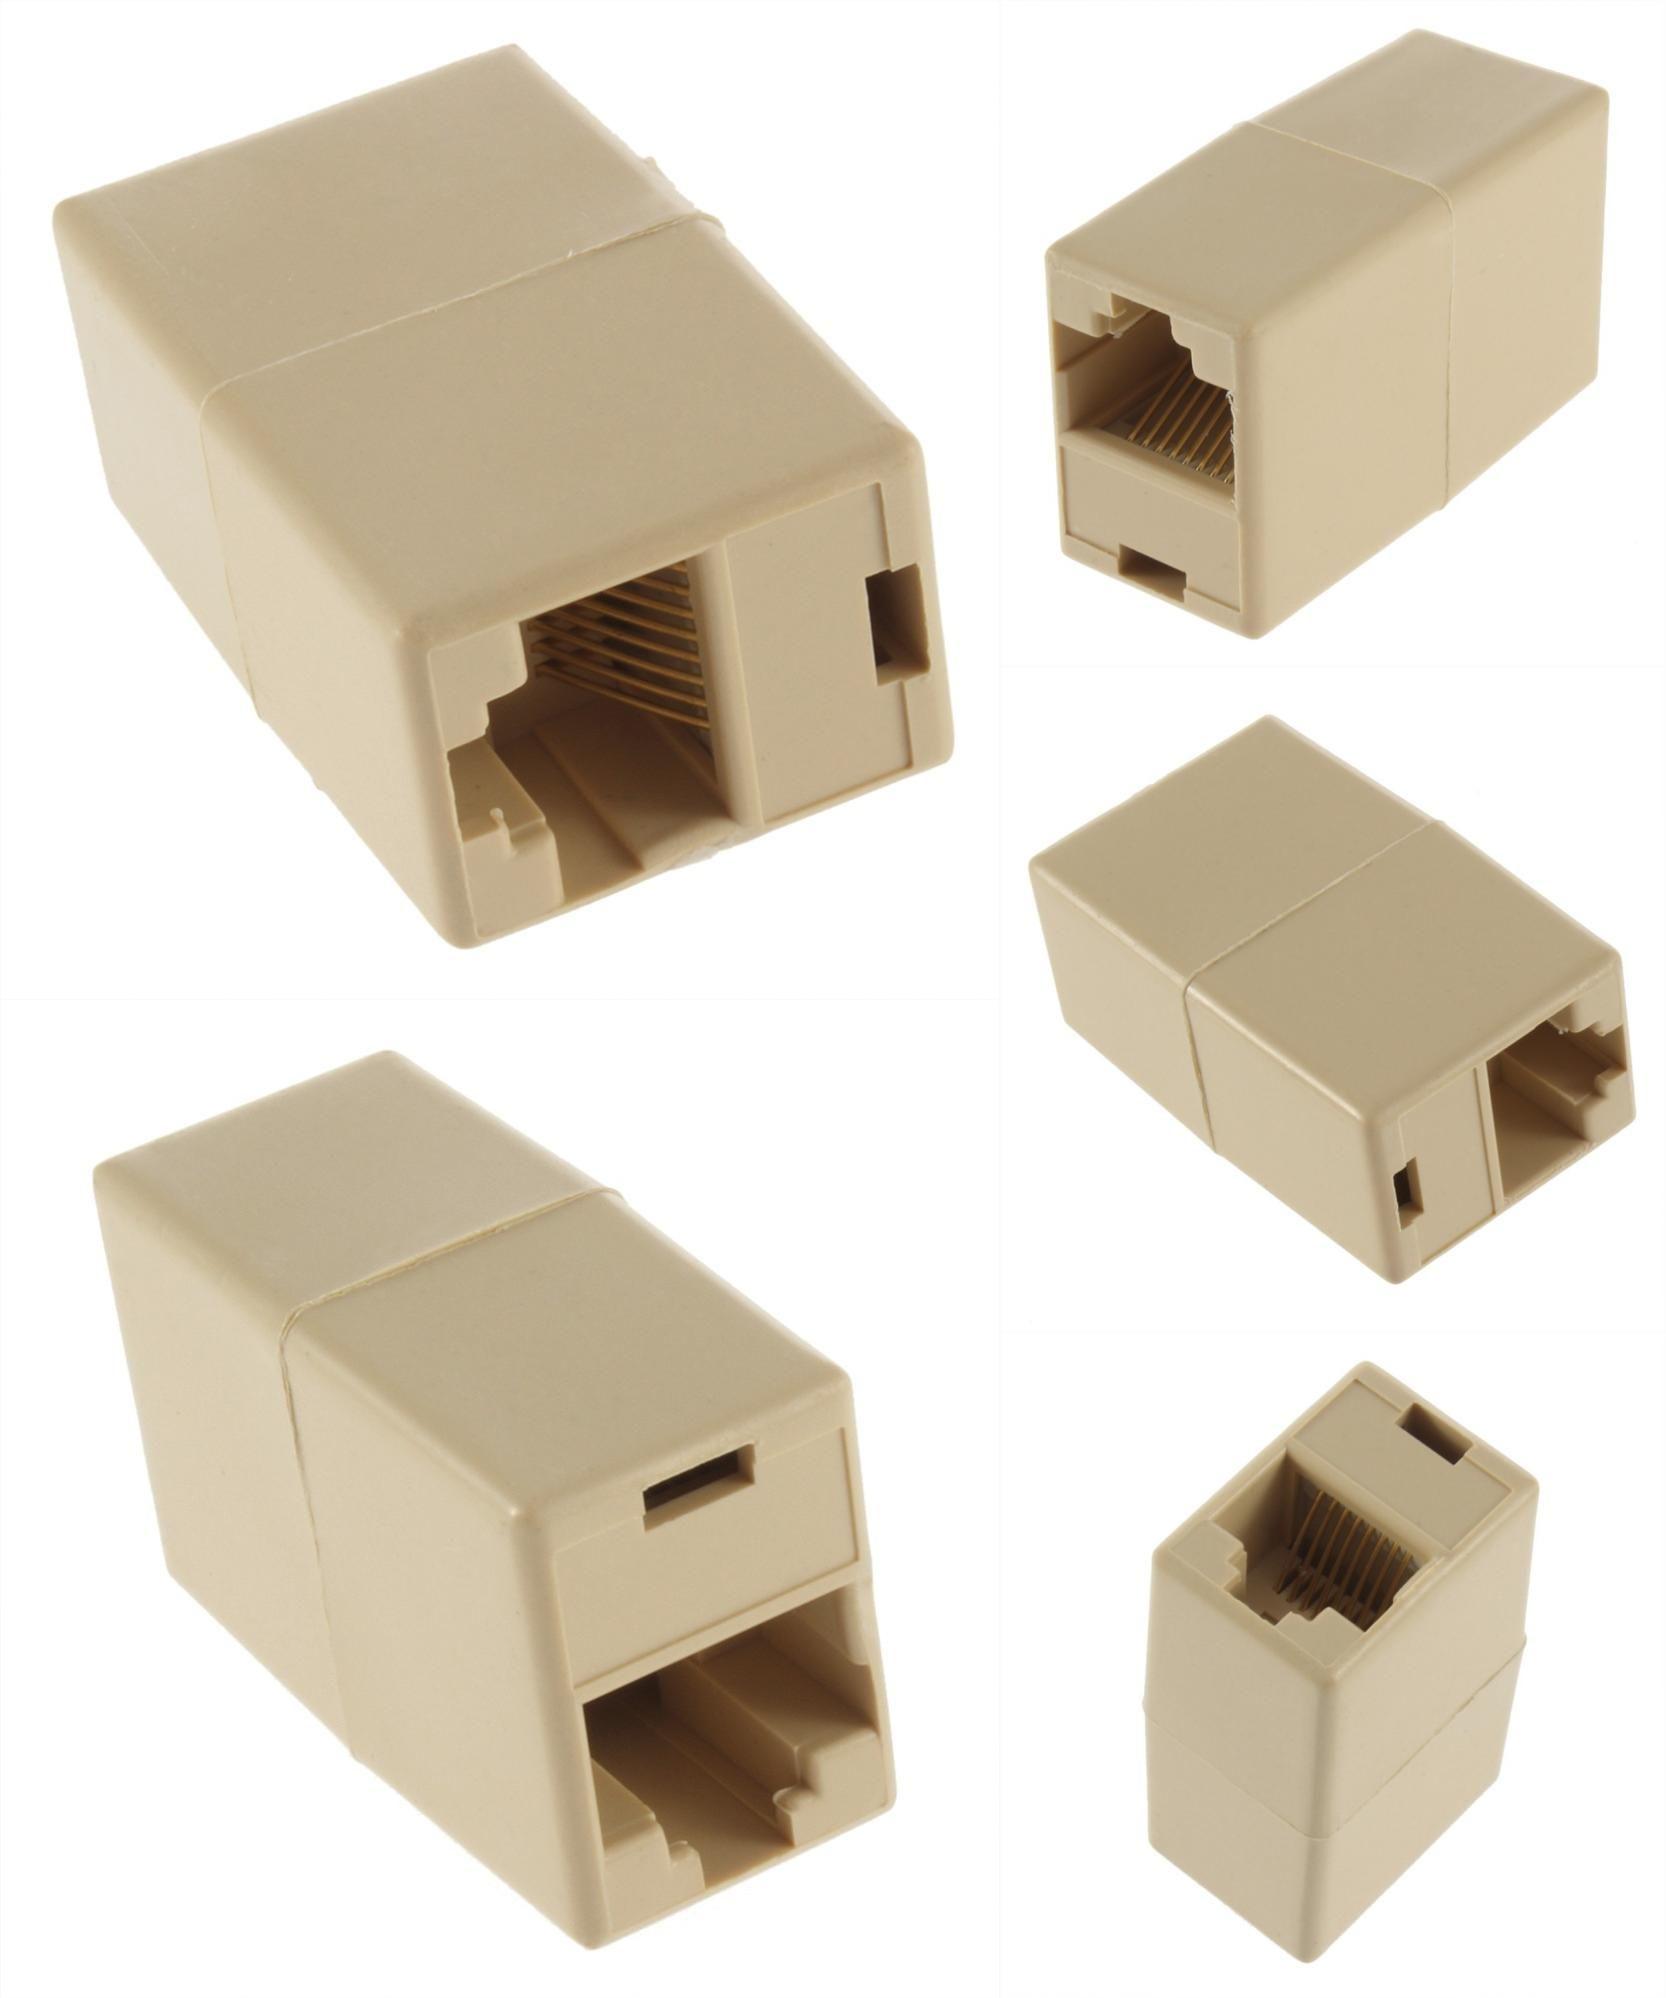 Visit To Buy Rj45 Cat 5 5e Ethernet Lan Cable Joiner Coupler Connector Coupler Jointer Plug Advertisement Flash Drive Usb Flash Drive Rj45